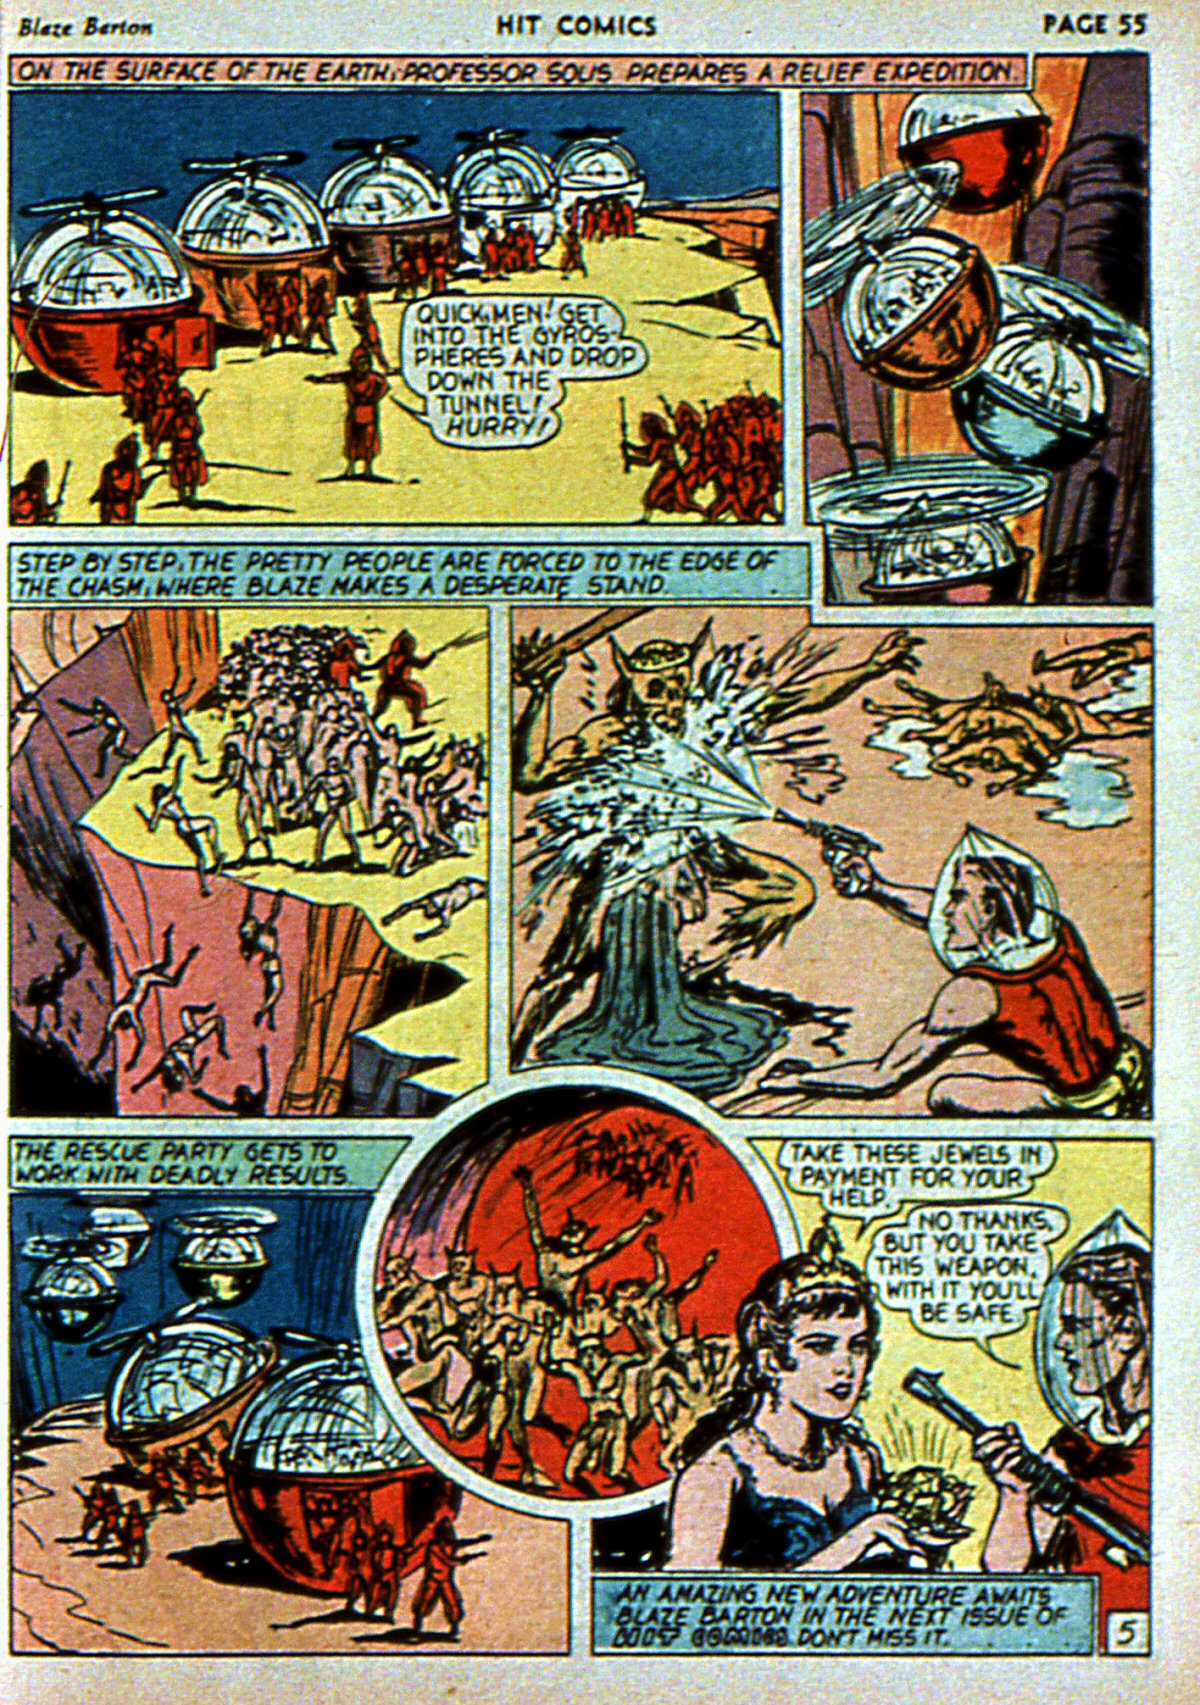 Read online Hit Comics comic -  Issue #3 - 57